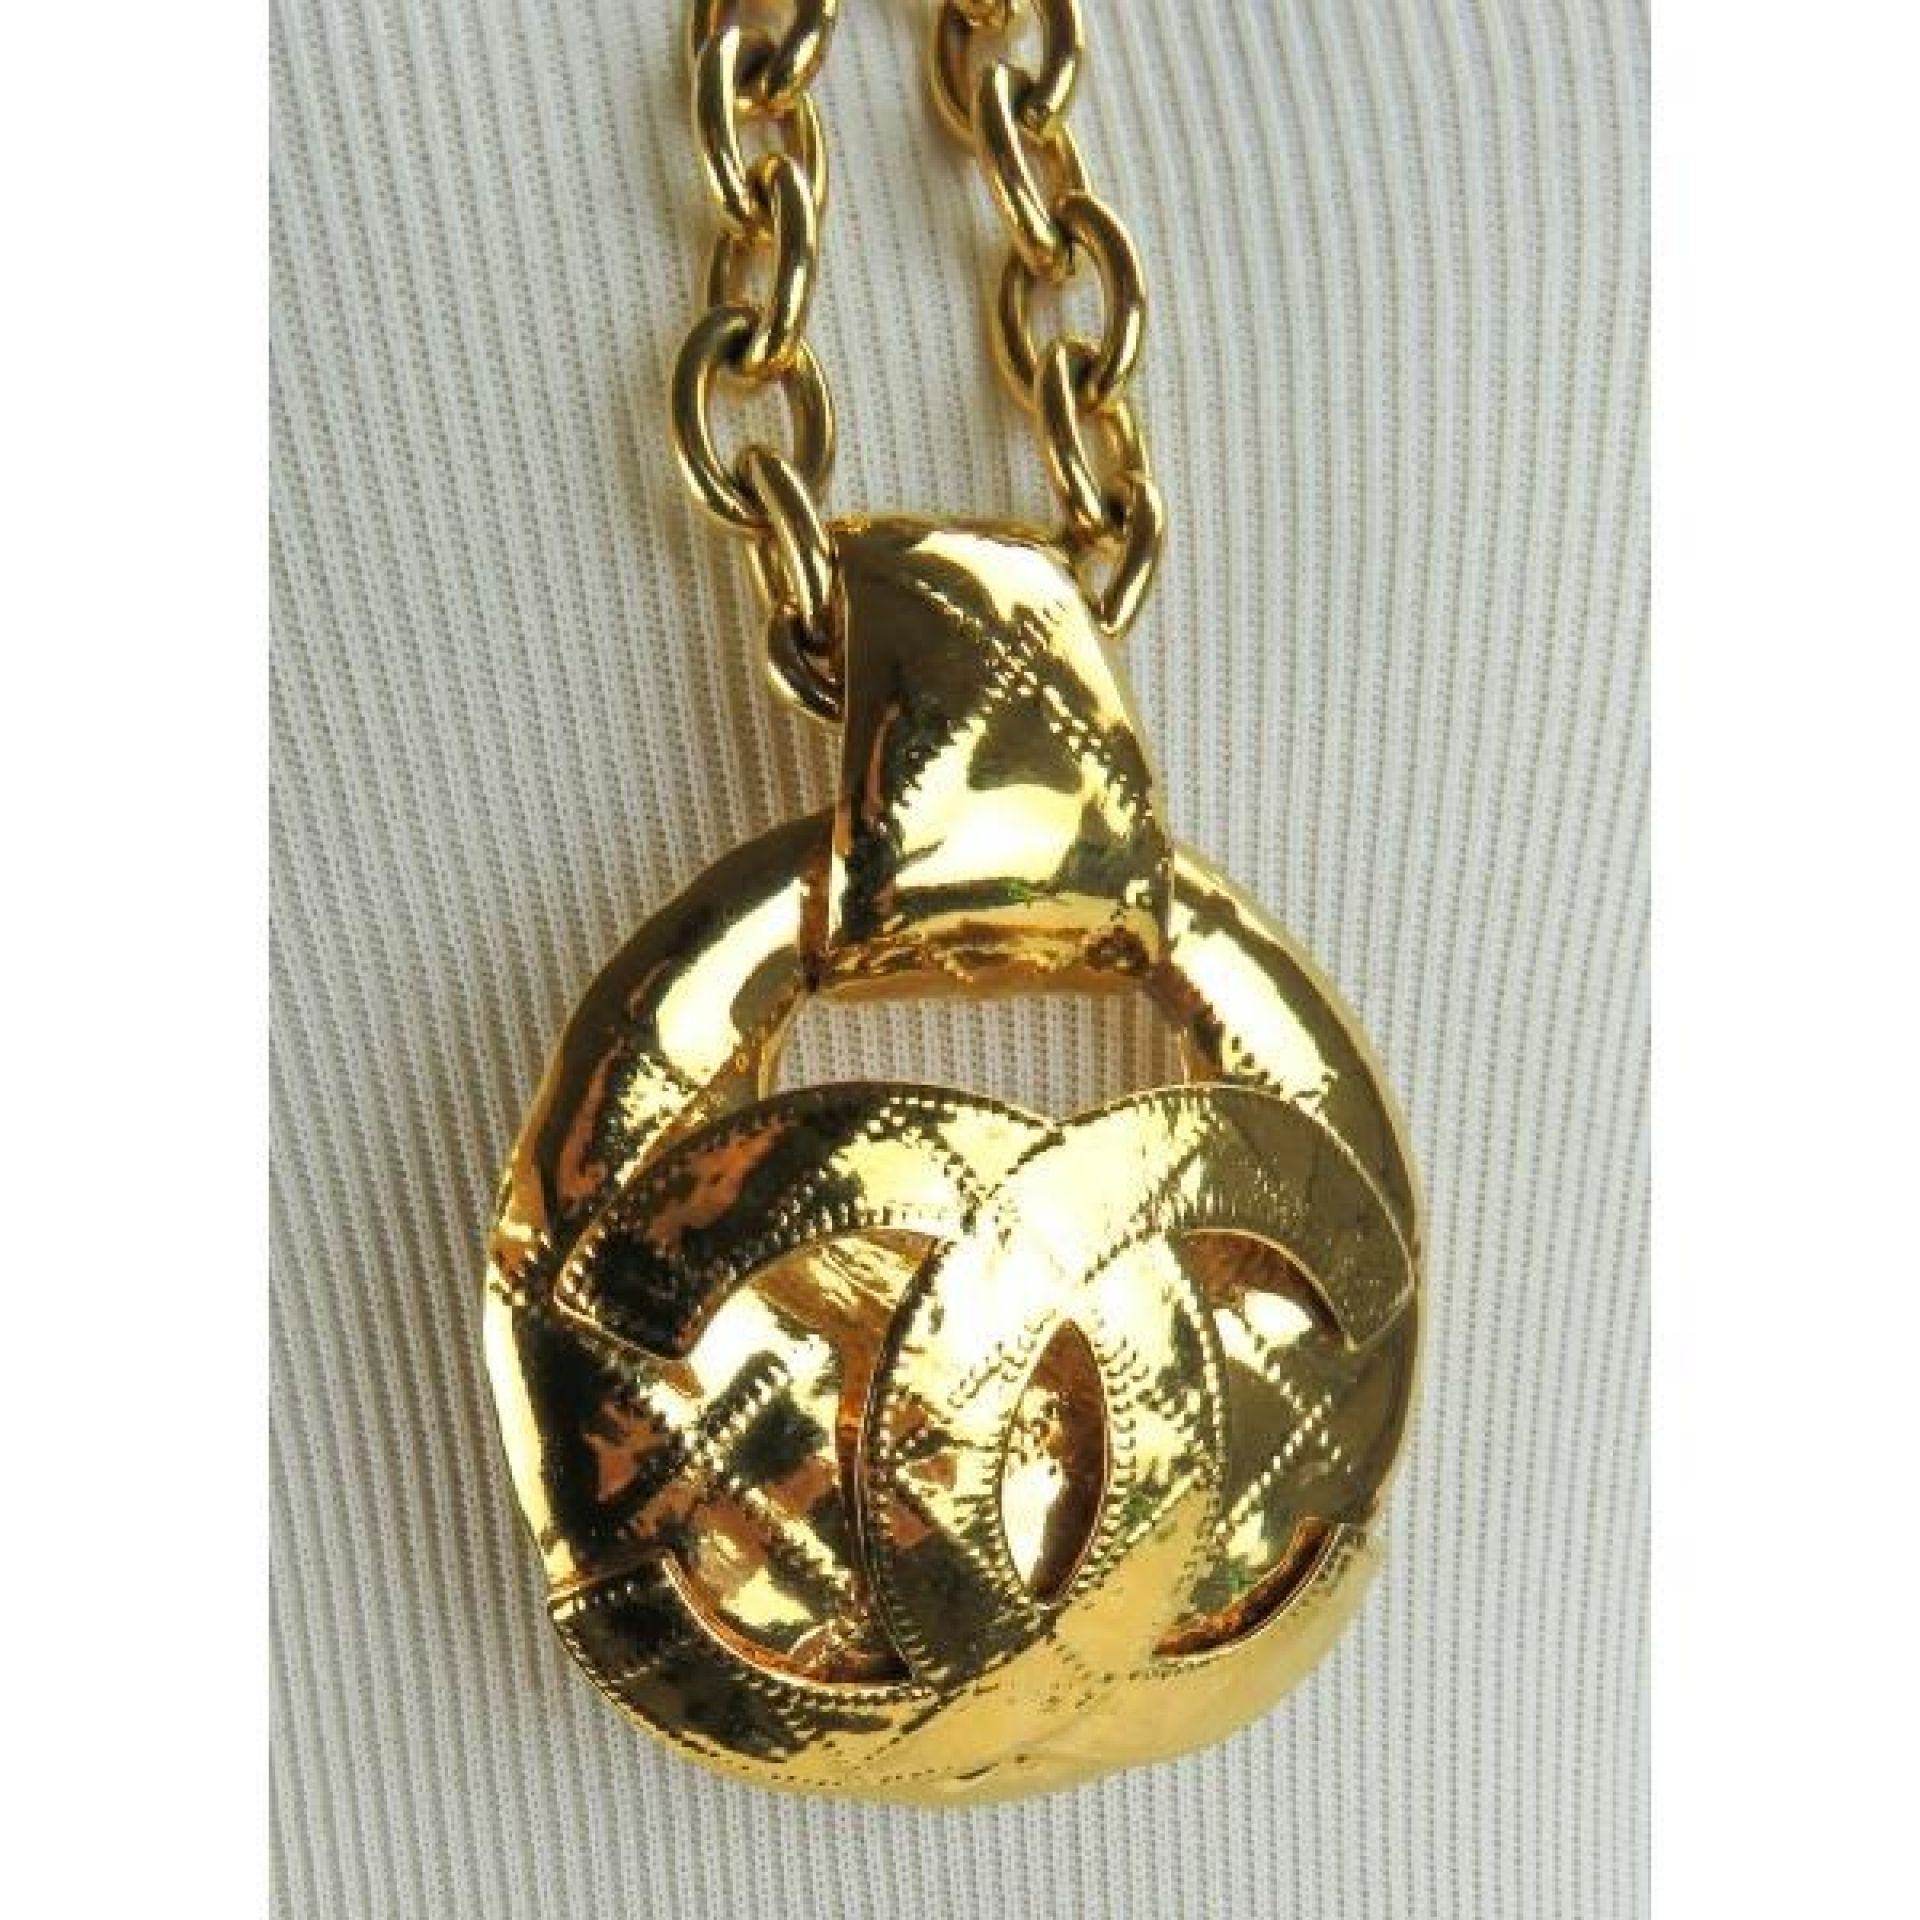 Chanel Gold-Tone Medallion Chain CC Logo Pendant Necklace